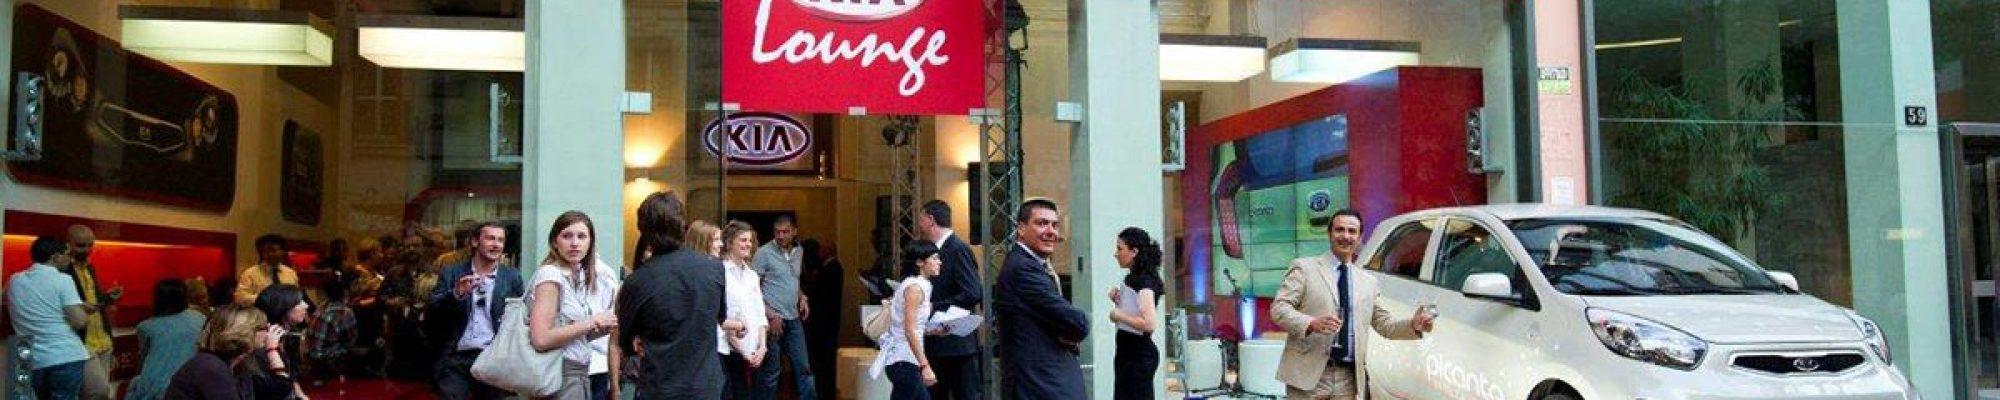 temporary-store-shop-milano-corso-garibaldi-evento-kia-lounge-musica-giusy-ferreri-pop-up-noleggio